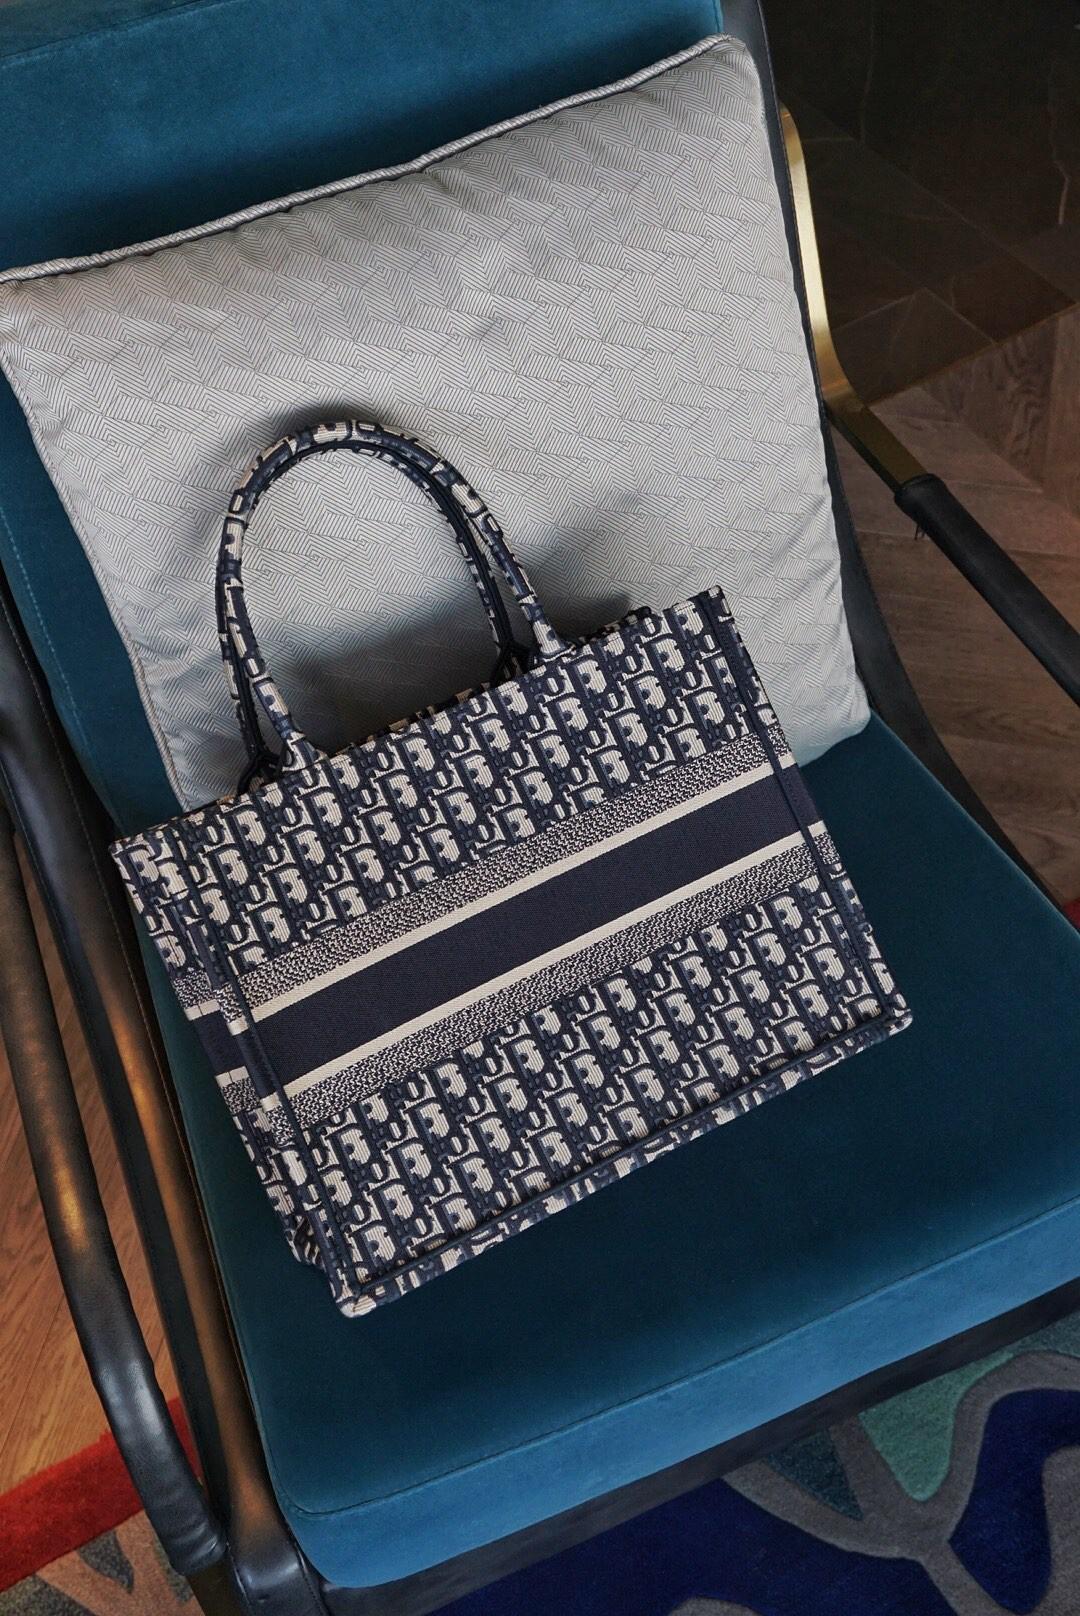 DIOR迪奥 购物袋 布纹蓝 36.5cm 小号,任何人都能驾驭